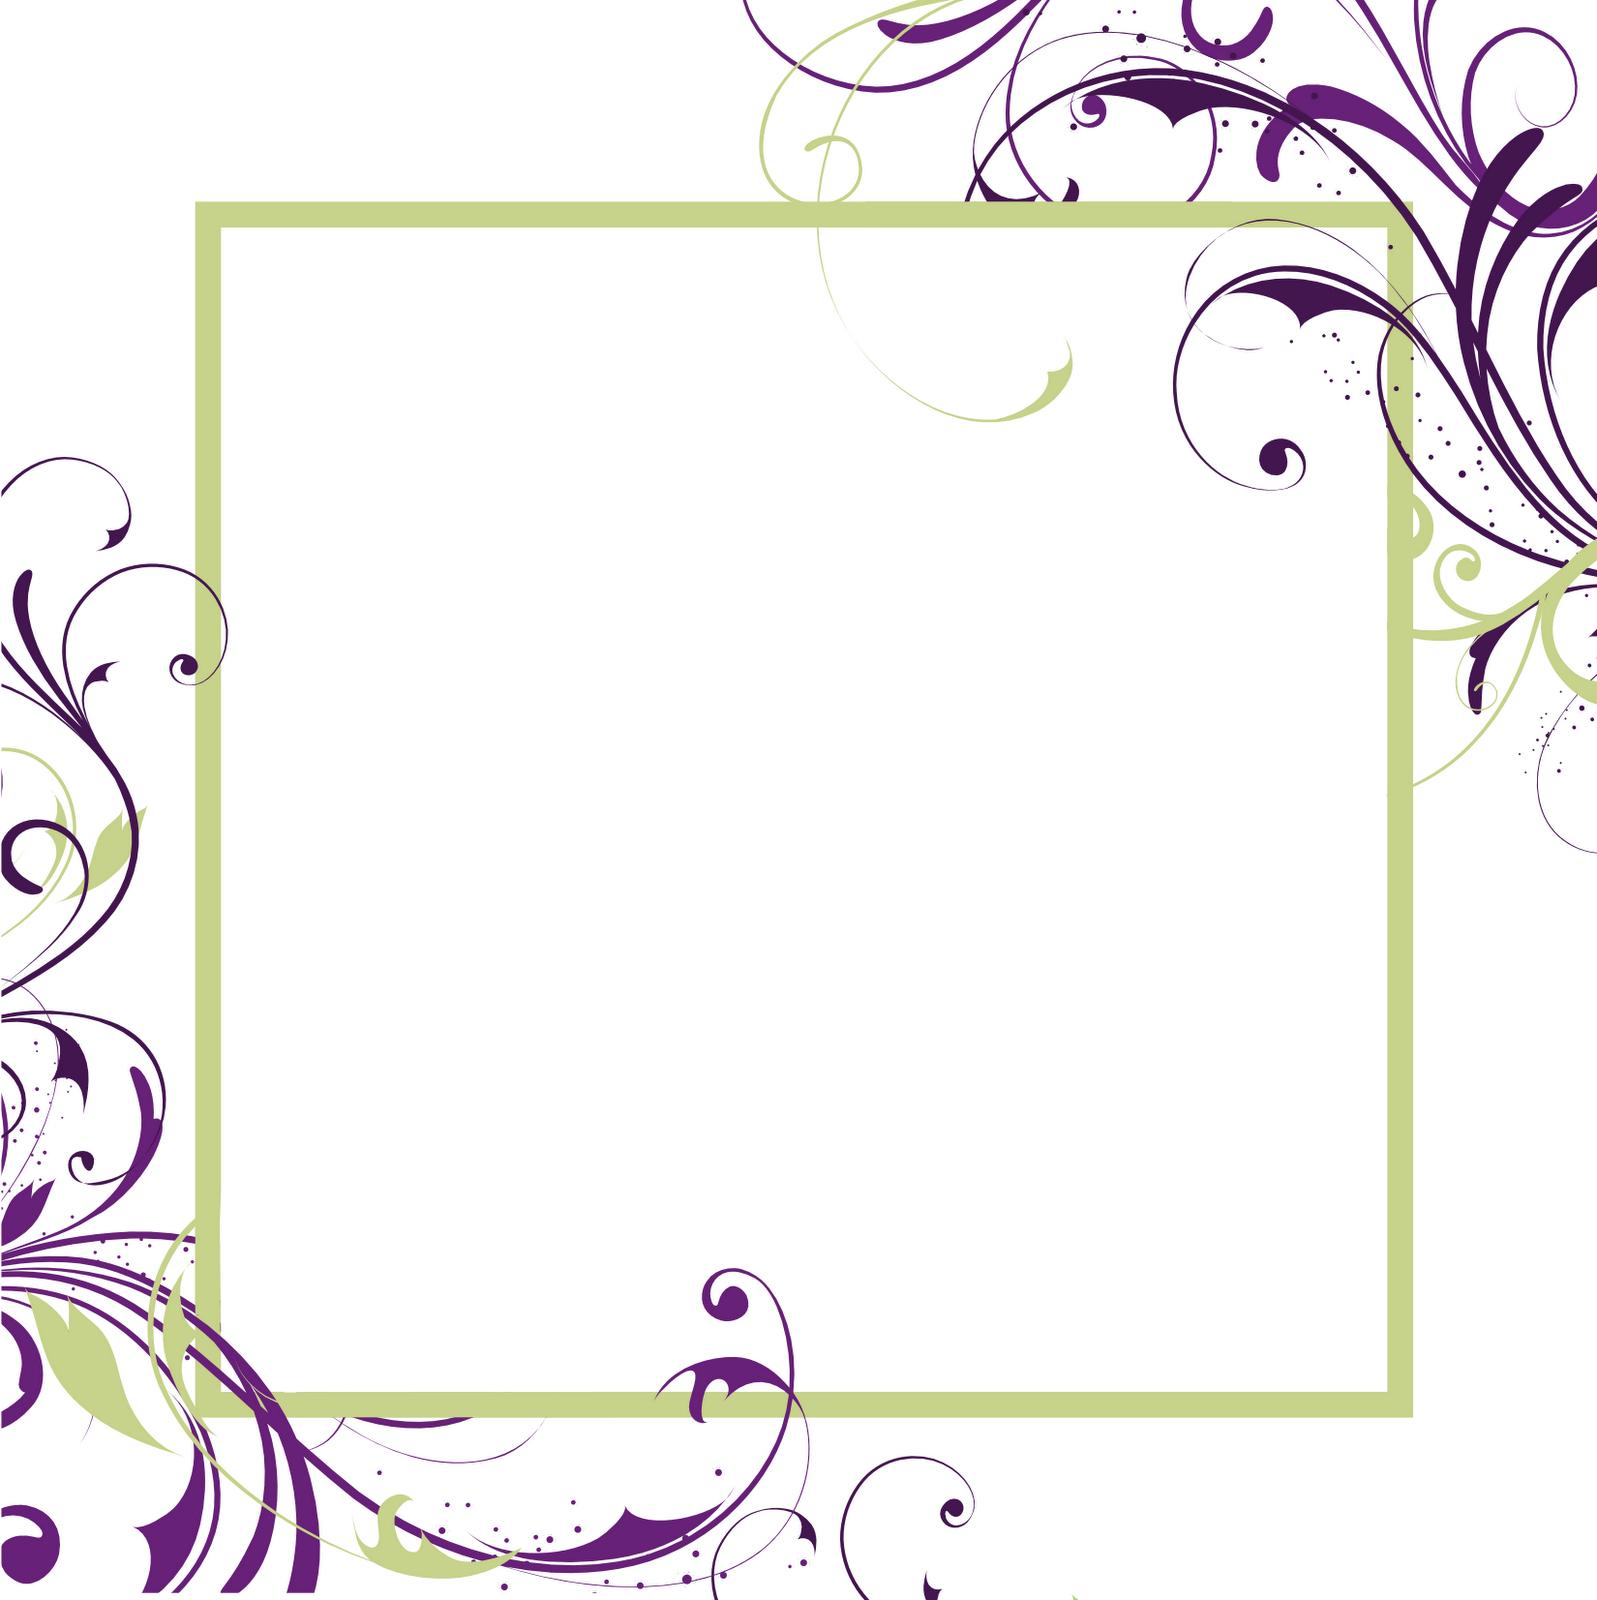 Free Printable Blank Invitations Templates | Wedding Invite Template - Wedding Invitation Cards Printable Free